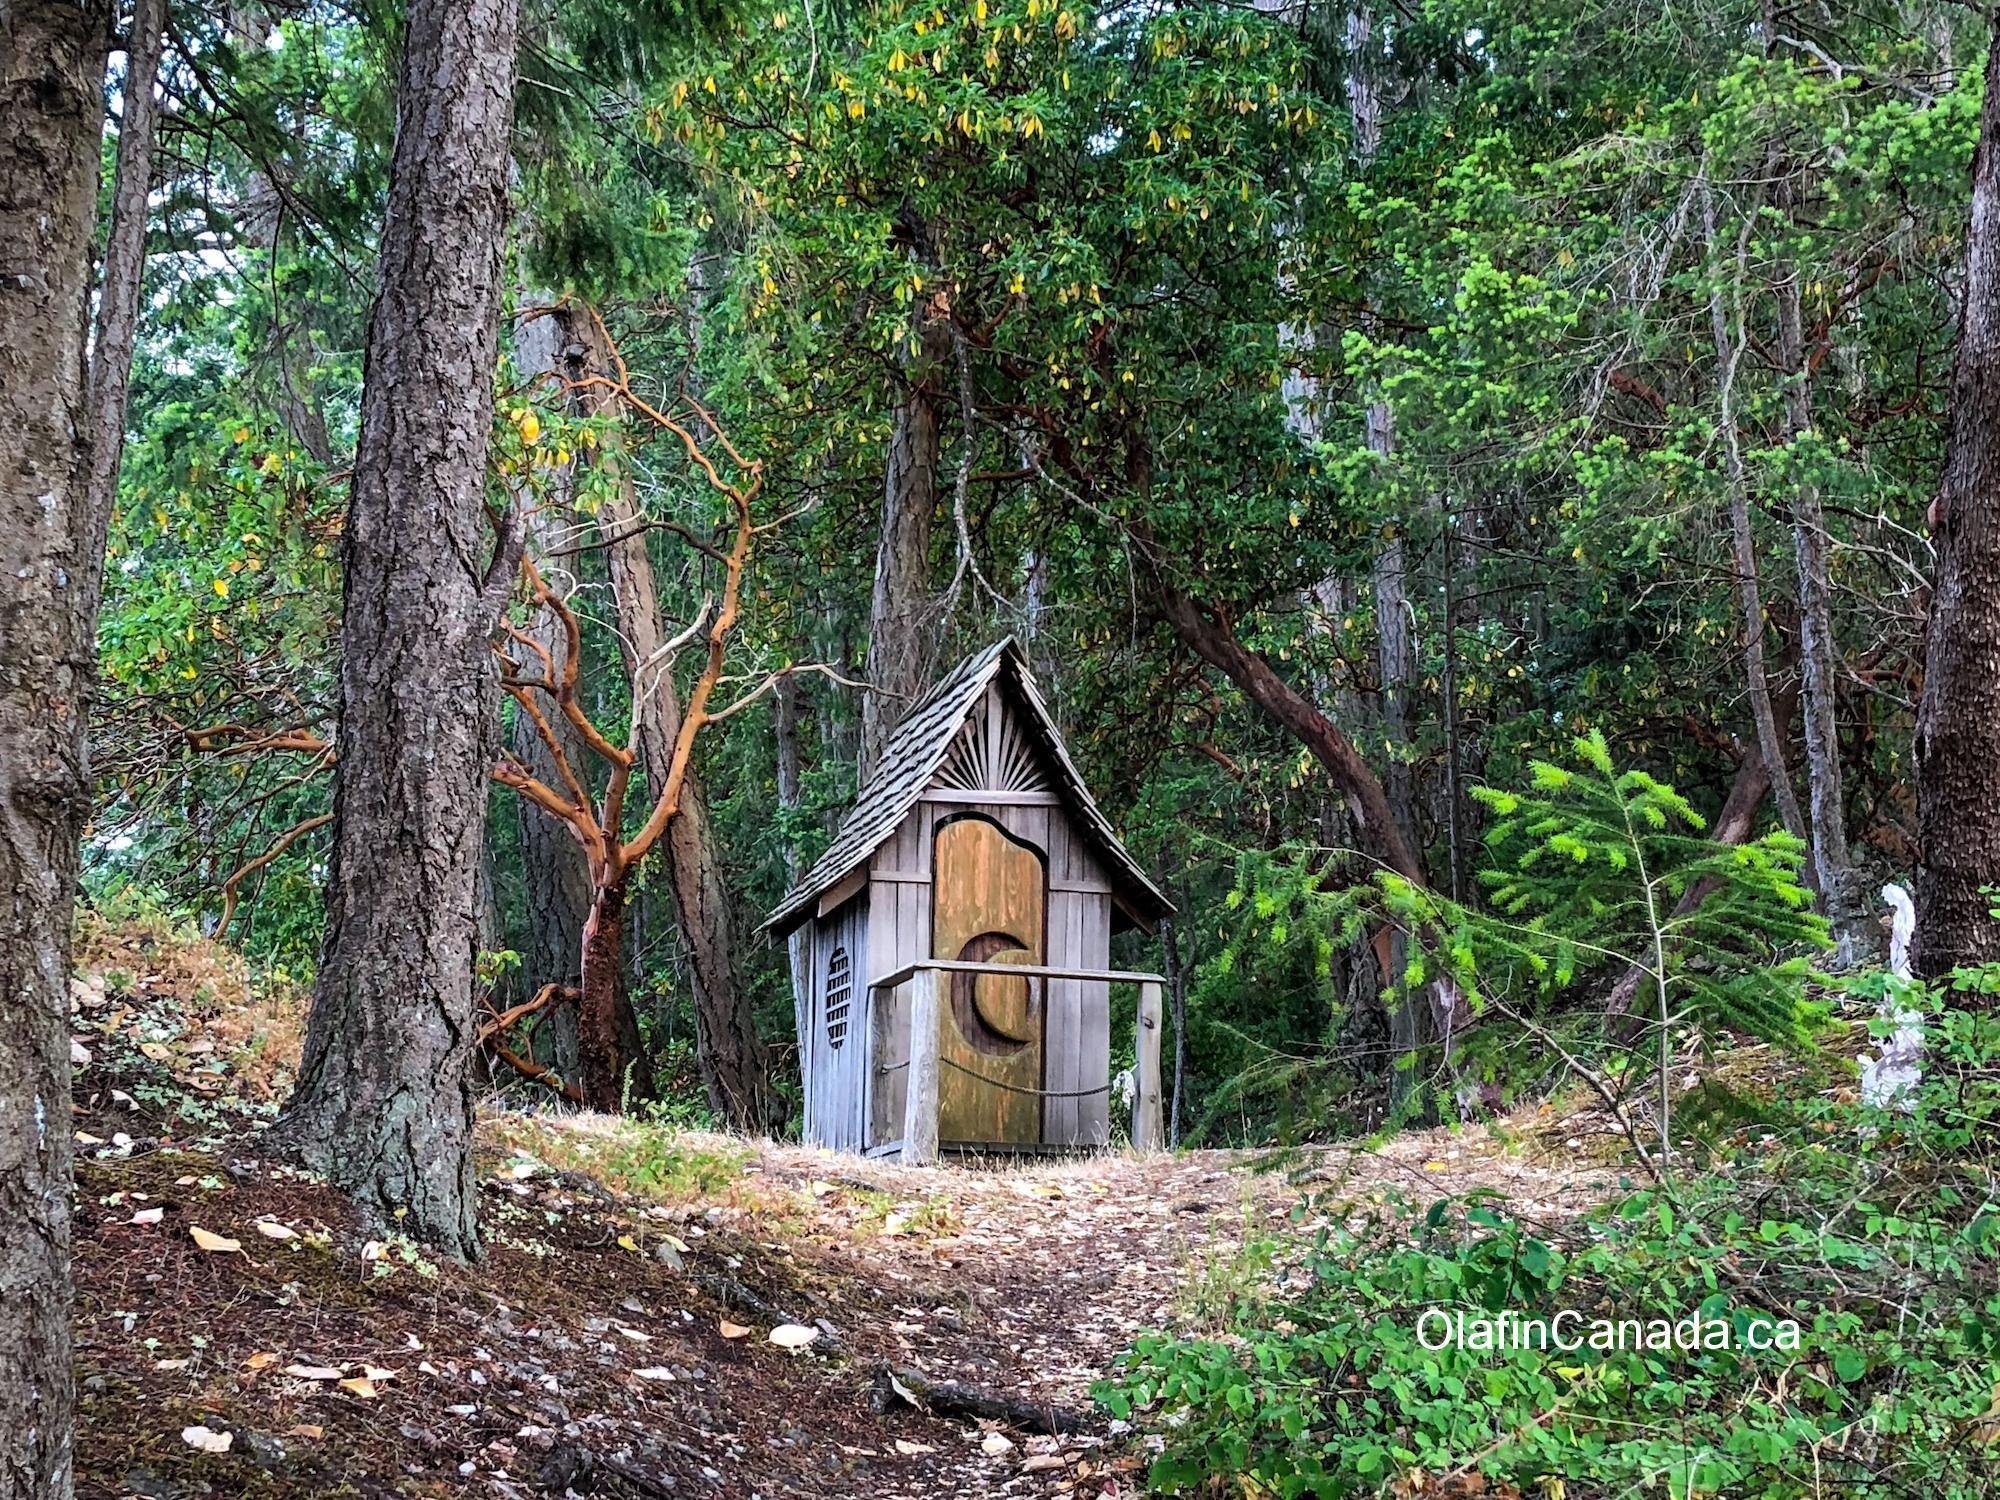 Tailor made outhouse near Salt Spring Island #olafincanada #britishcolumbia #discoverbc #saltspringisland #outhouse